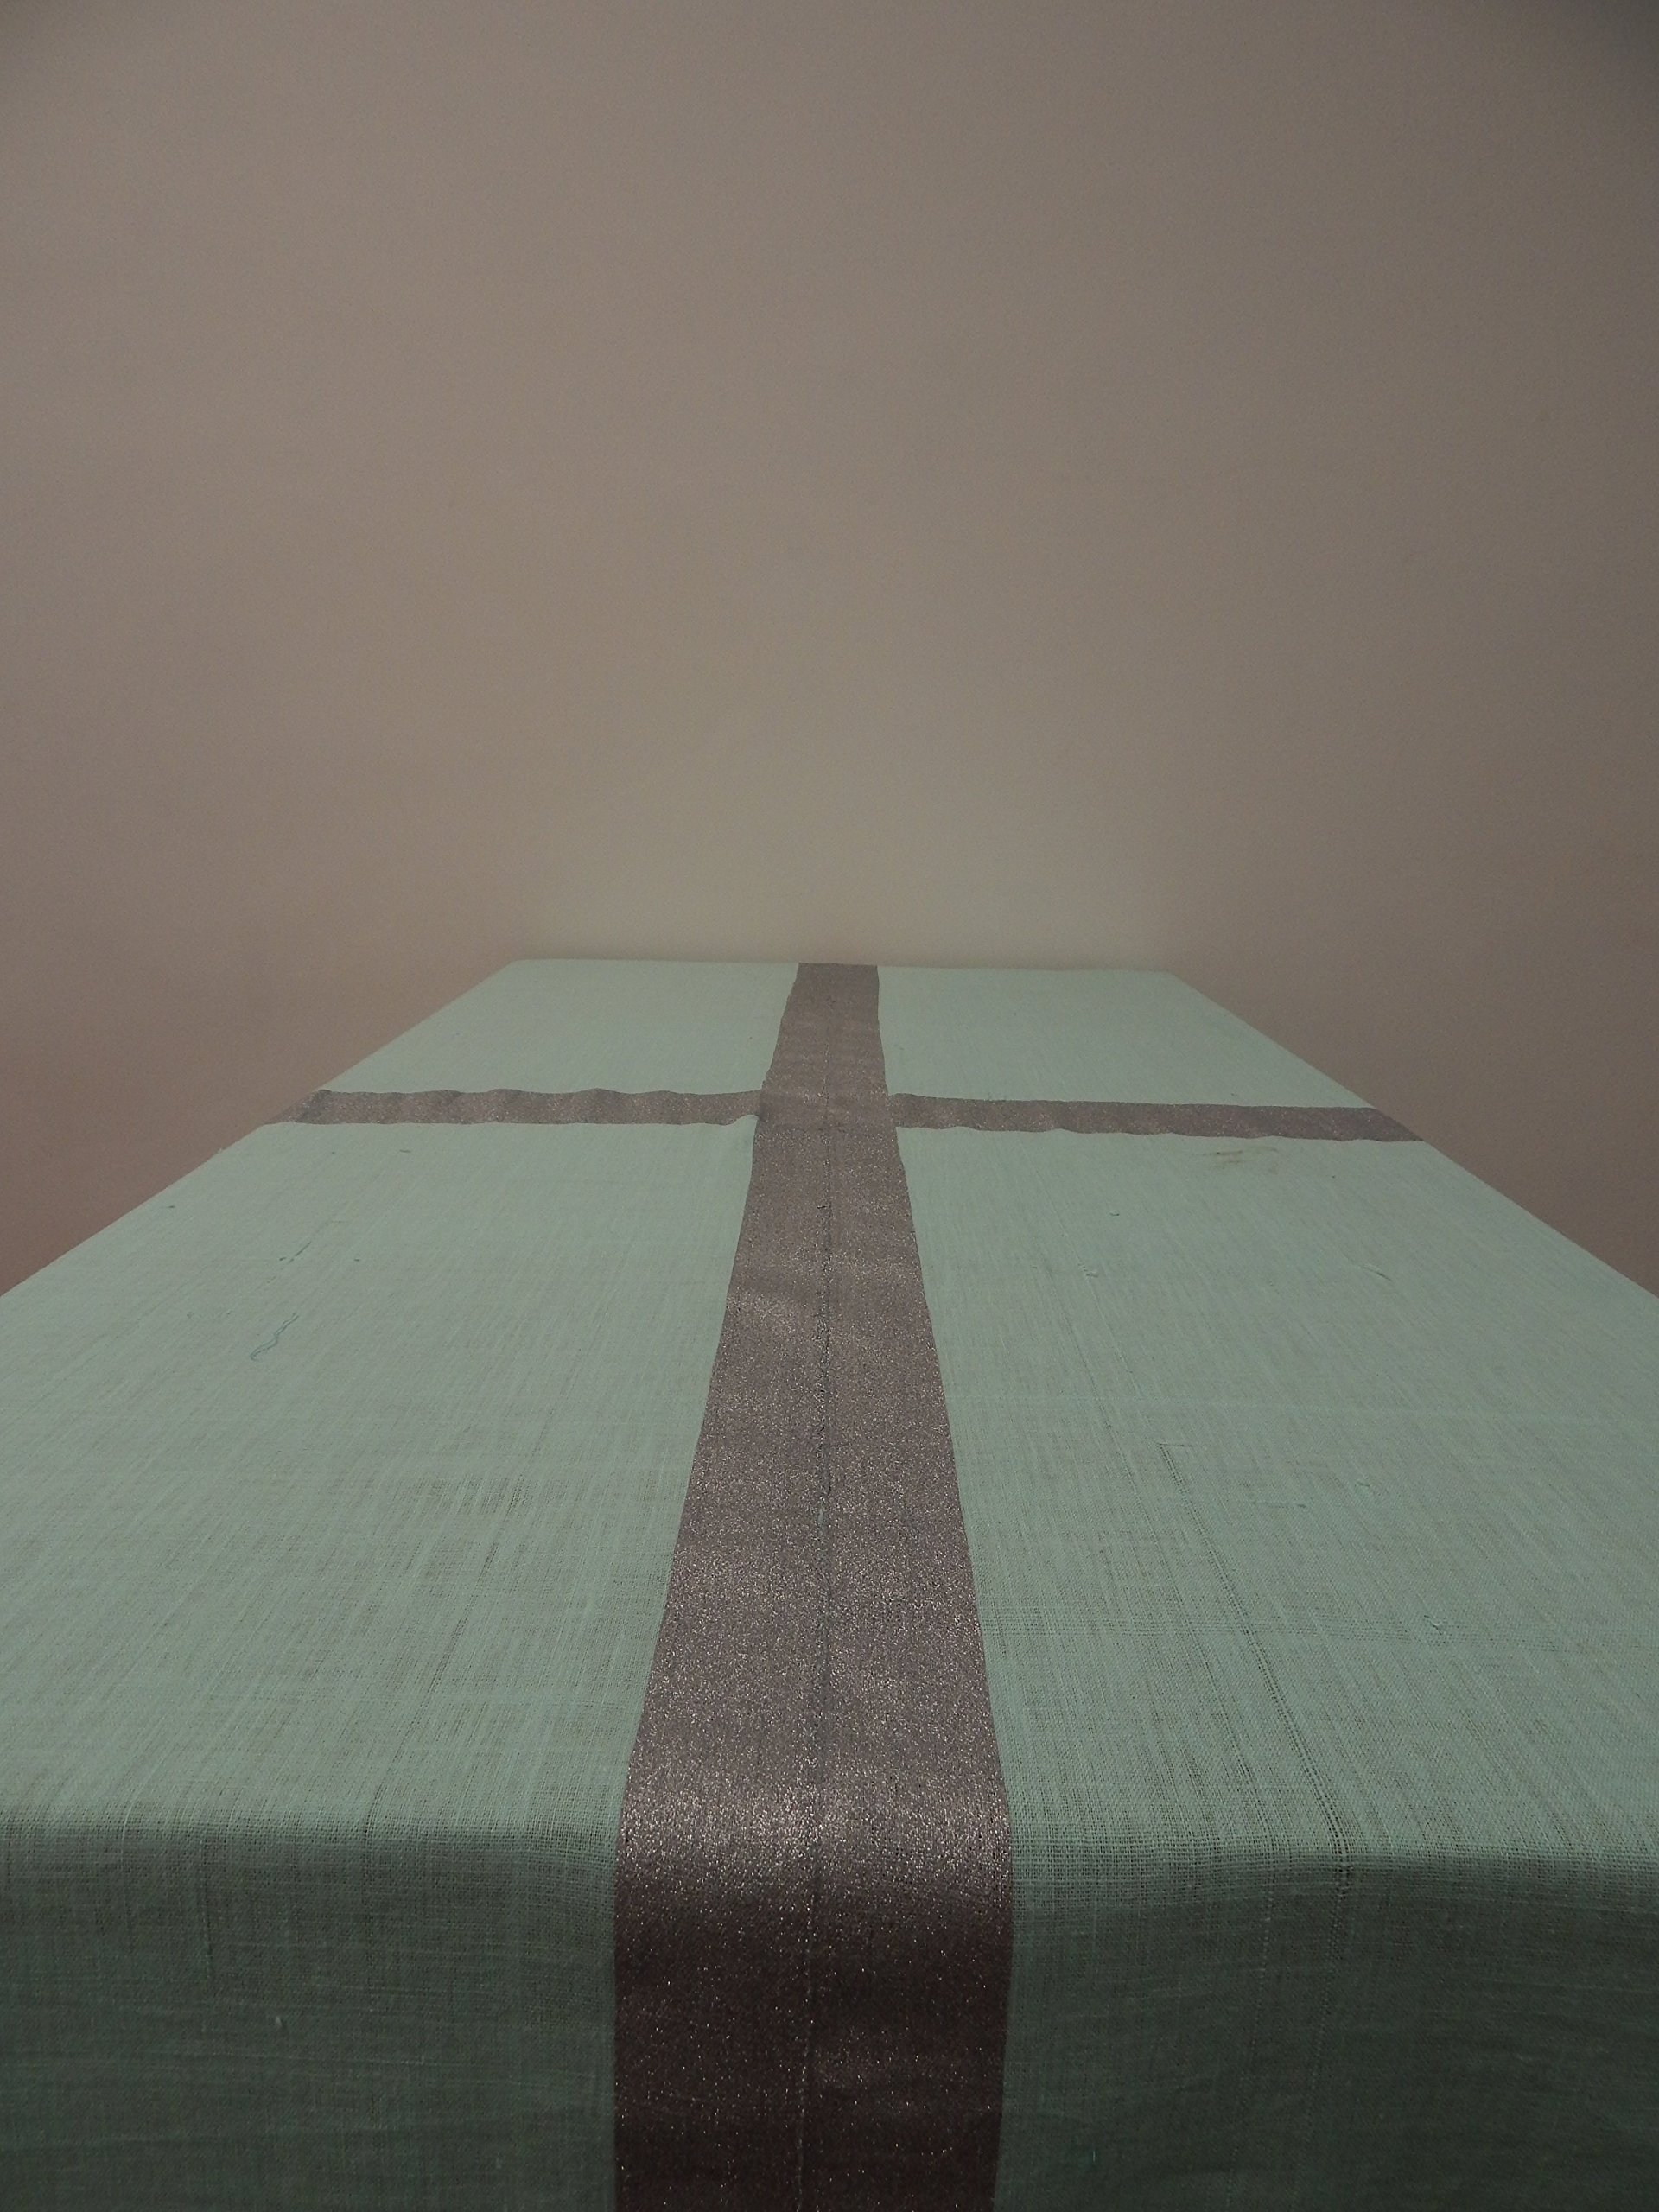 Gitika Goyal Home Cotton Khadi Silver Screen Printed Tablecloth with Border Design, Blue, 72'' x 72''